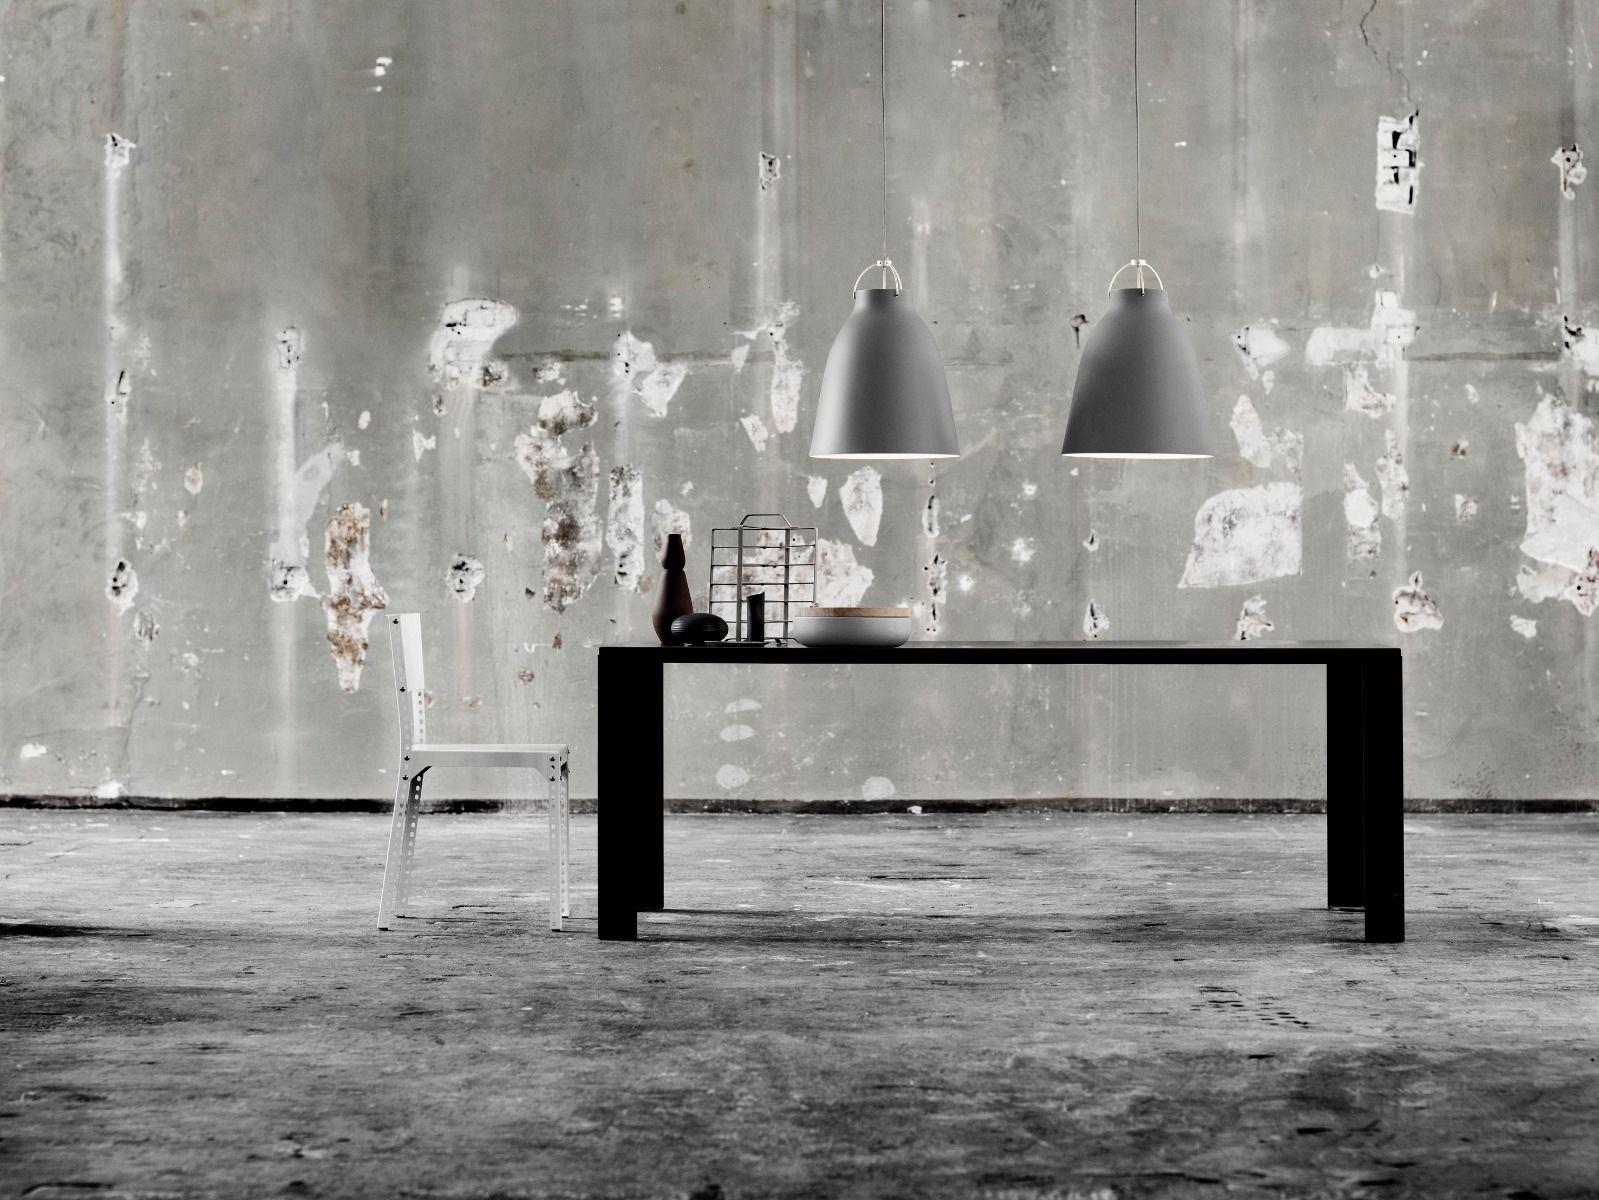 fritz hansen caravaggio pendant light matt grey hanging over black table